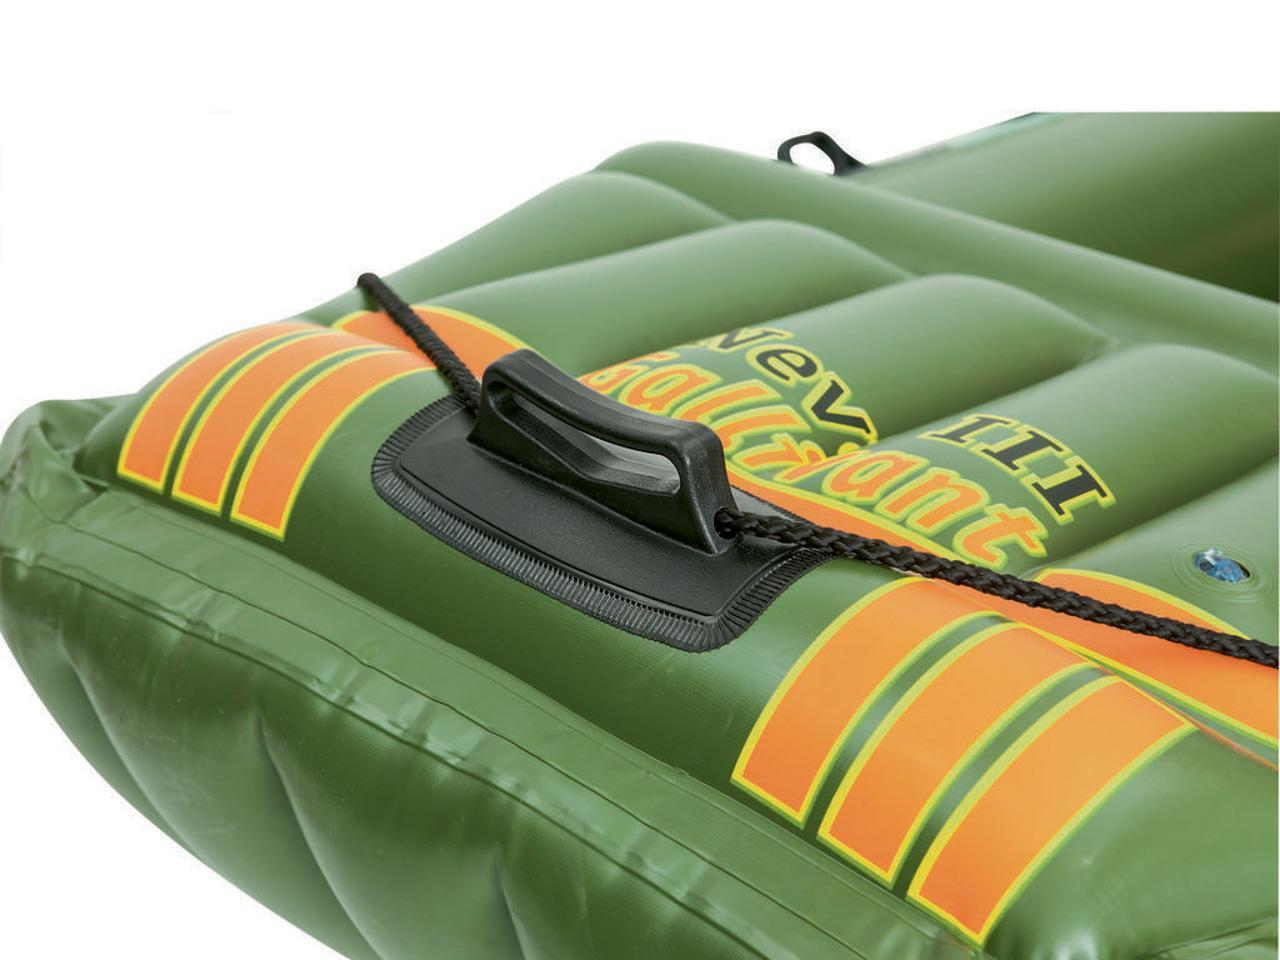 bateau gonflable neva iii 3.16 m